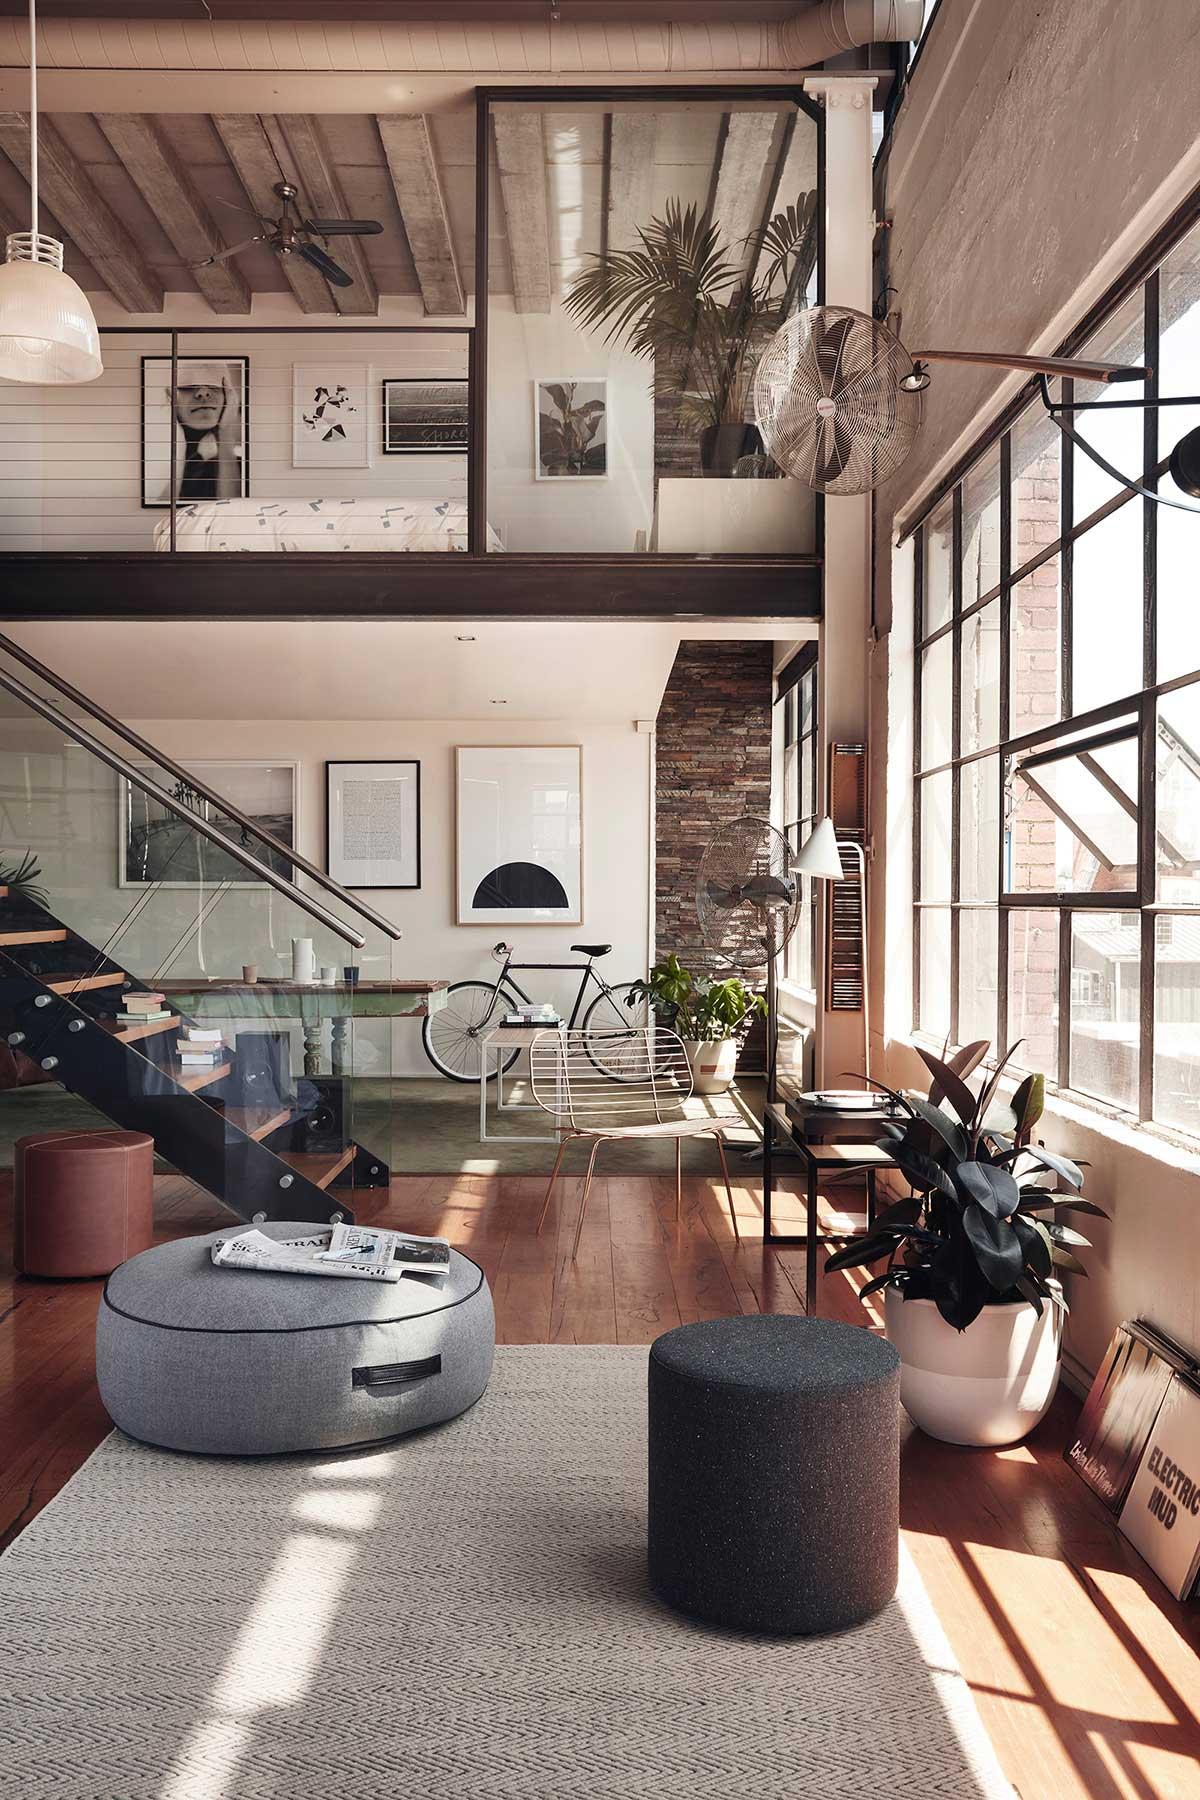 Interieur | Het ideale mannen interieur • Stijlvol Styling ...